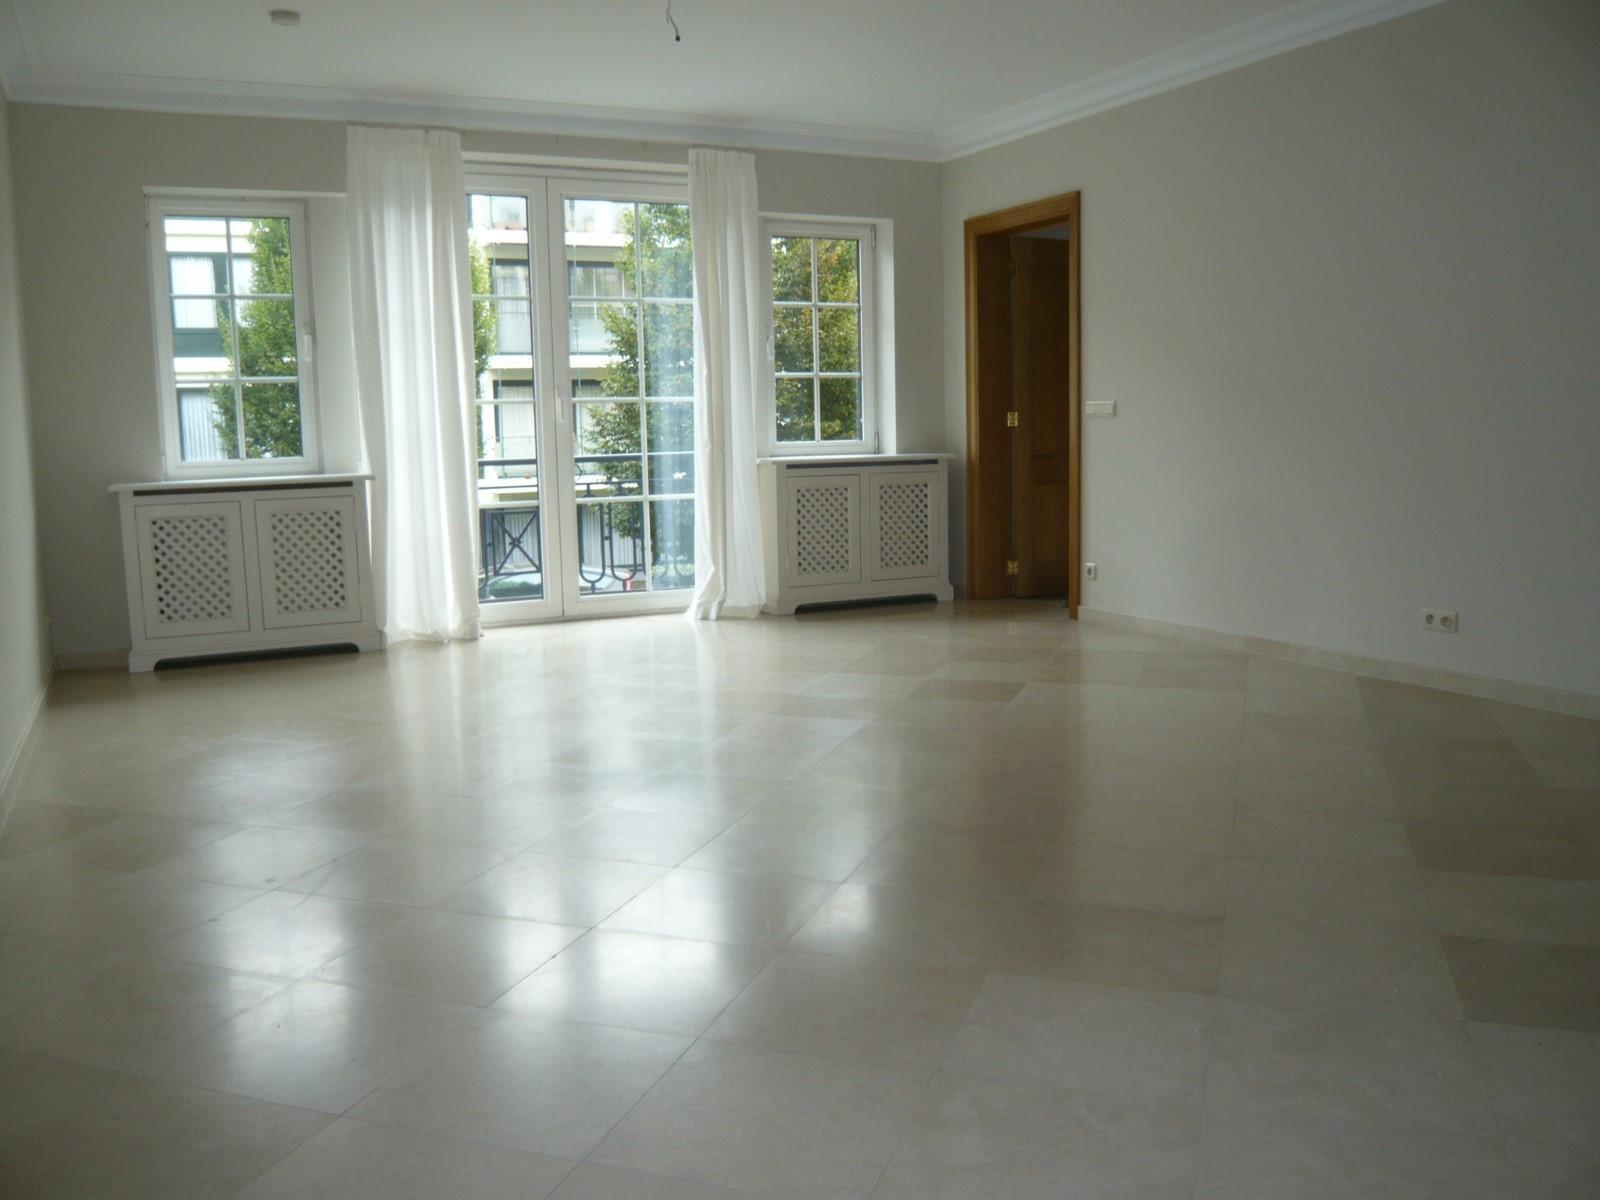 Appartement exceptionnel - Woluwe-Saint-Pierre - #2927607-1